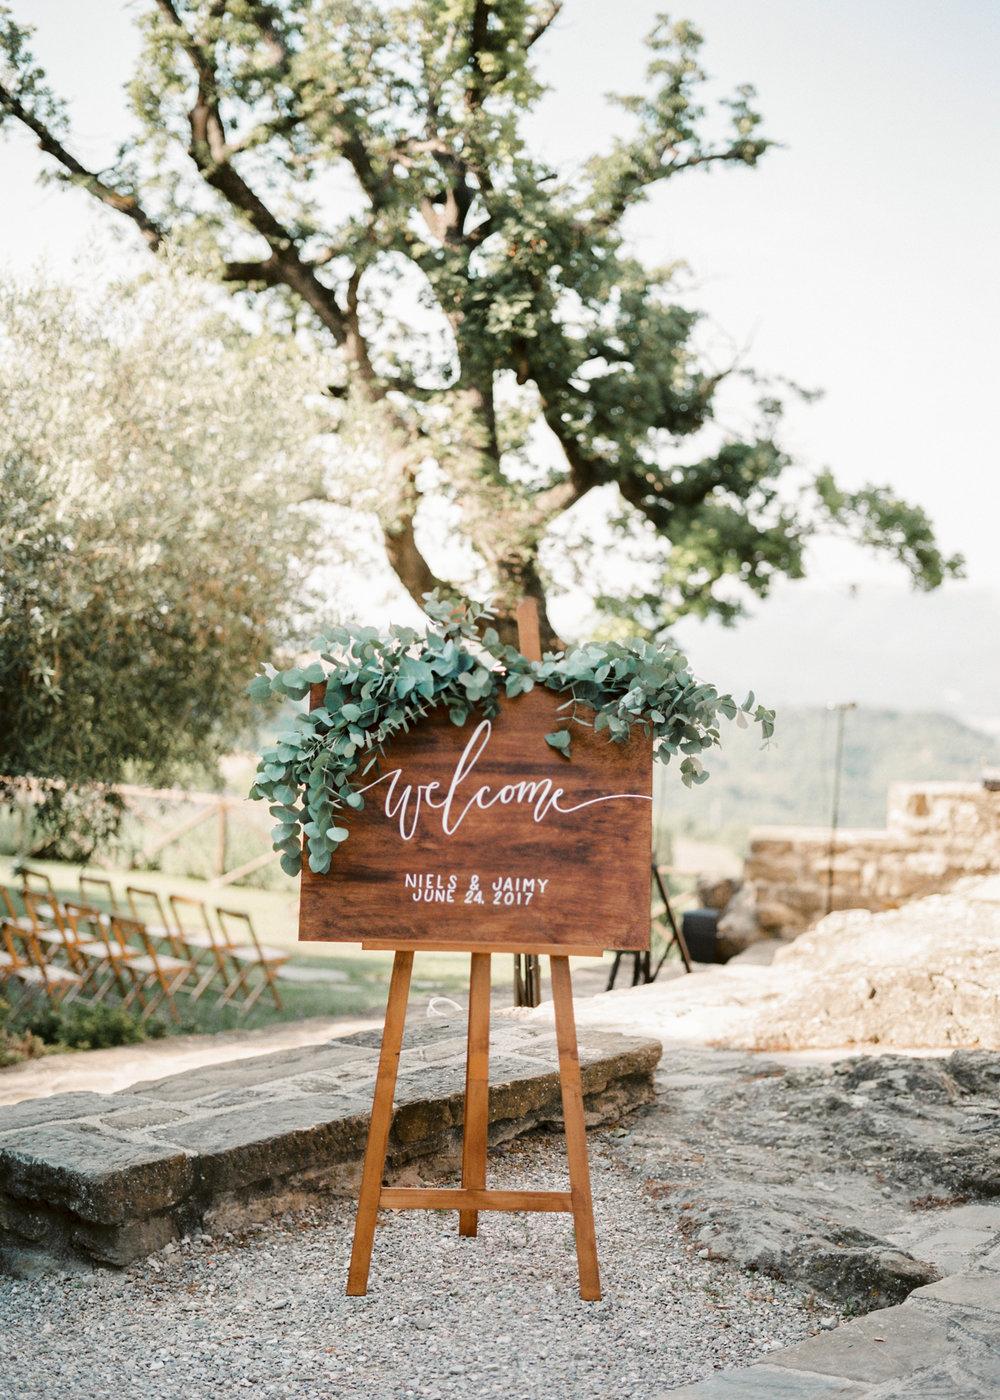 Amanda-Drost-Trouwen-in-Italie-fotografie-bruidsfotograaf-1.jpg